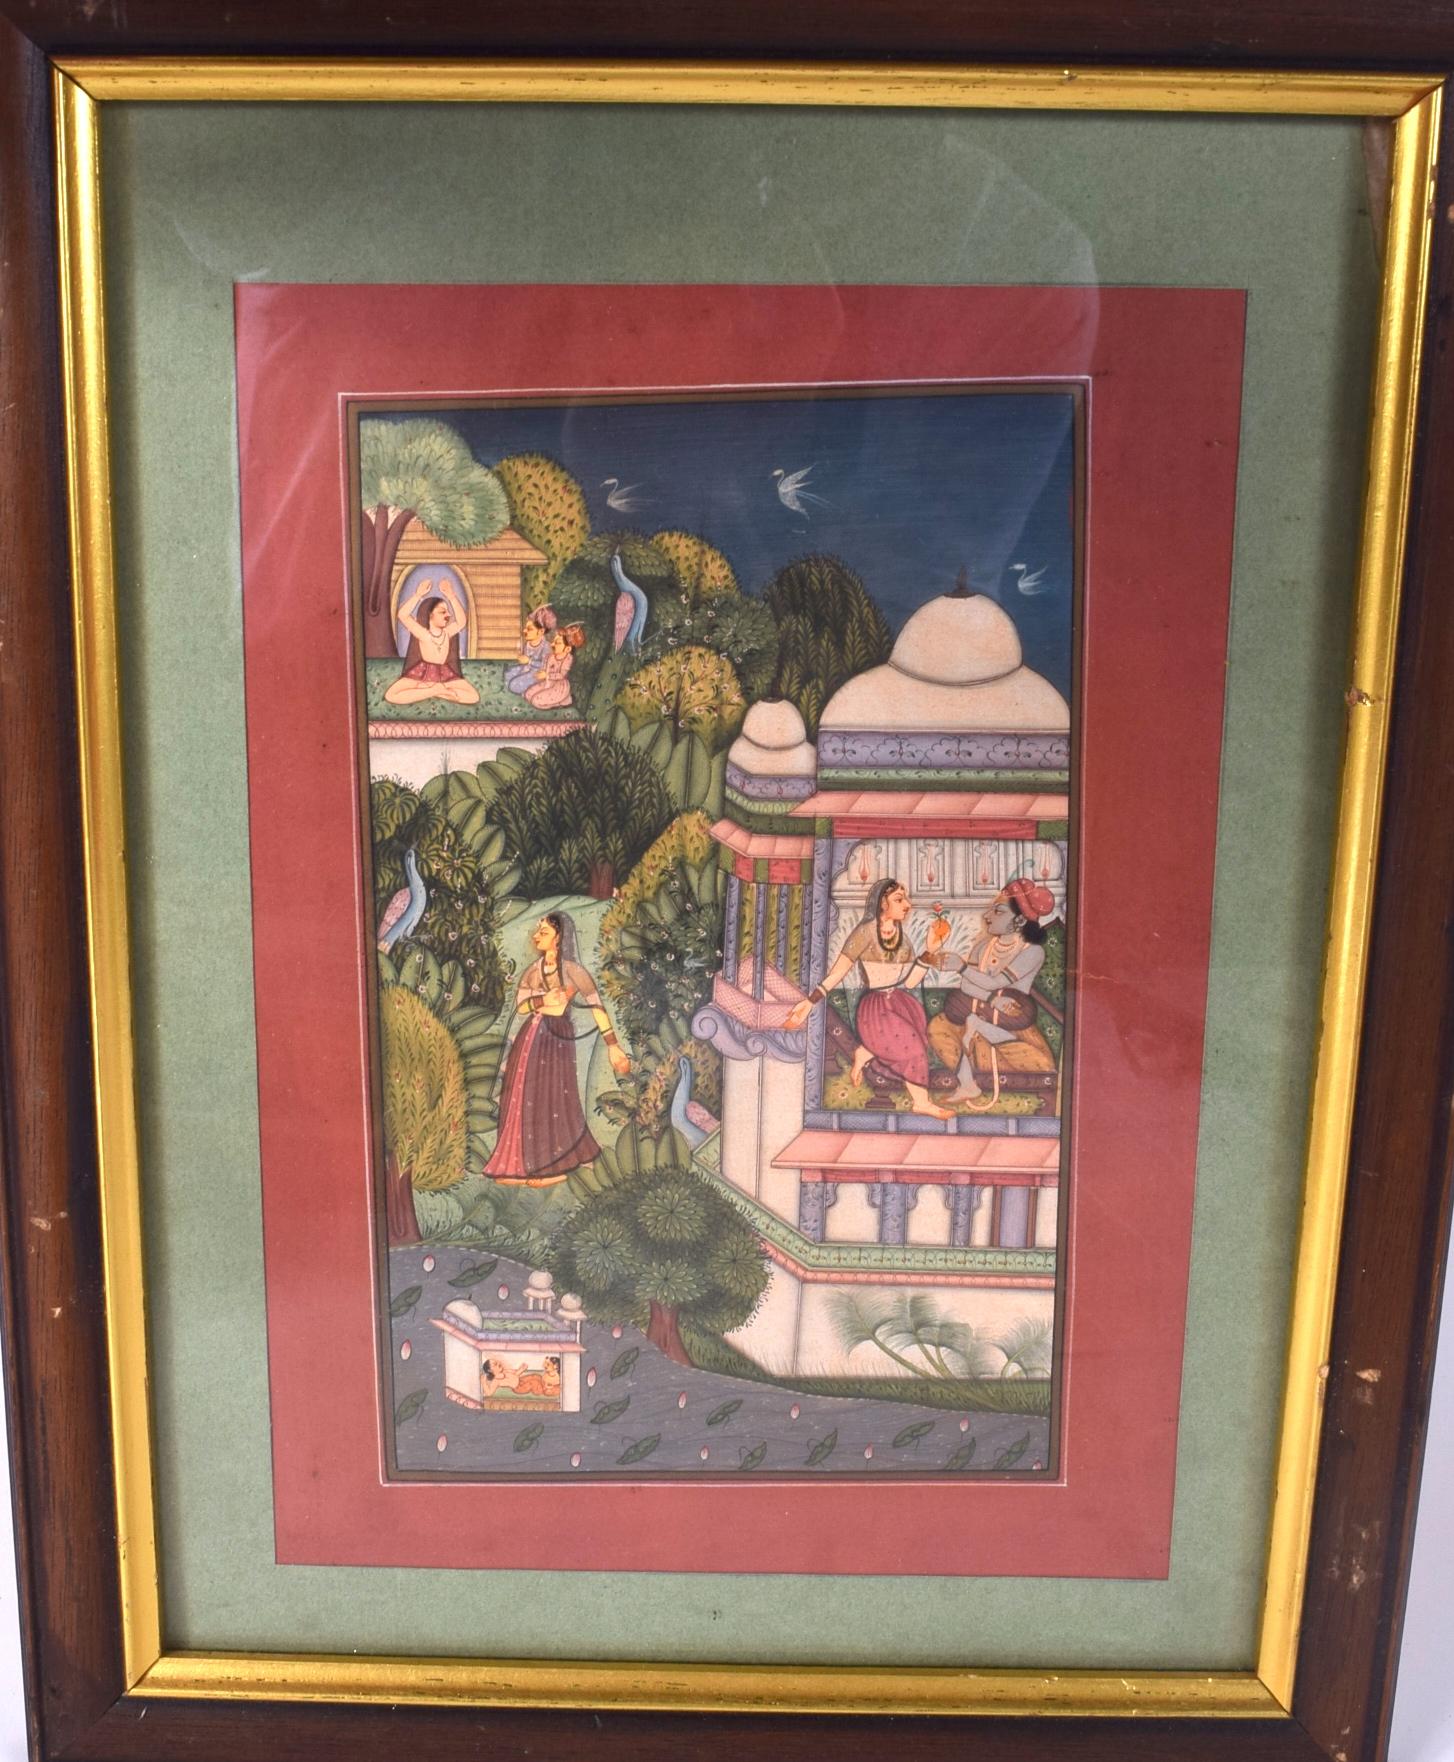 Lot 2580 - INDIAN SCHOOL (Early 20th century) FRAMED GOUACHE, figures in a landscape. 20.5 cm x 12 cm.